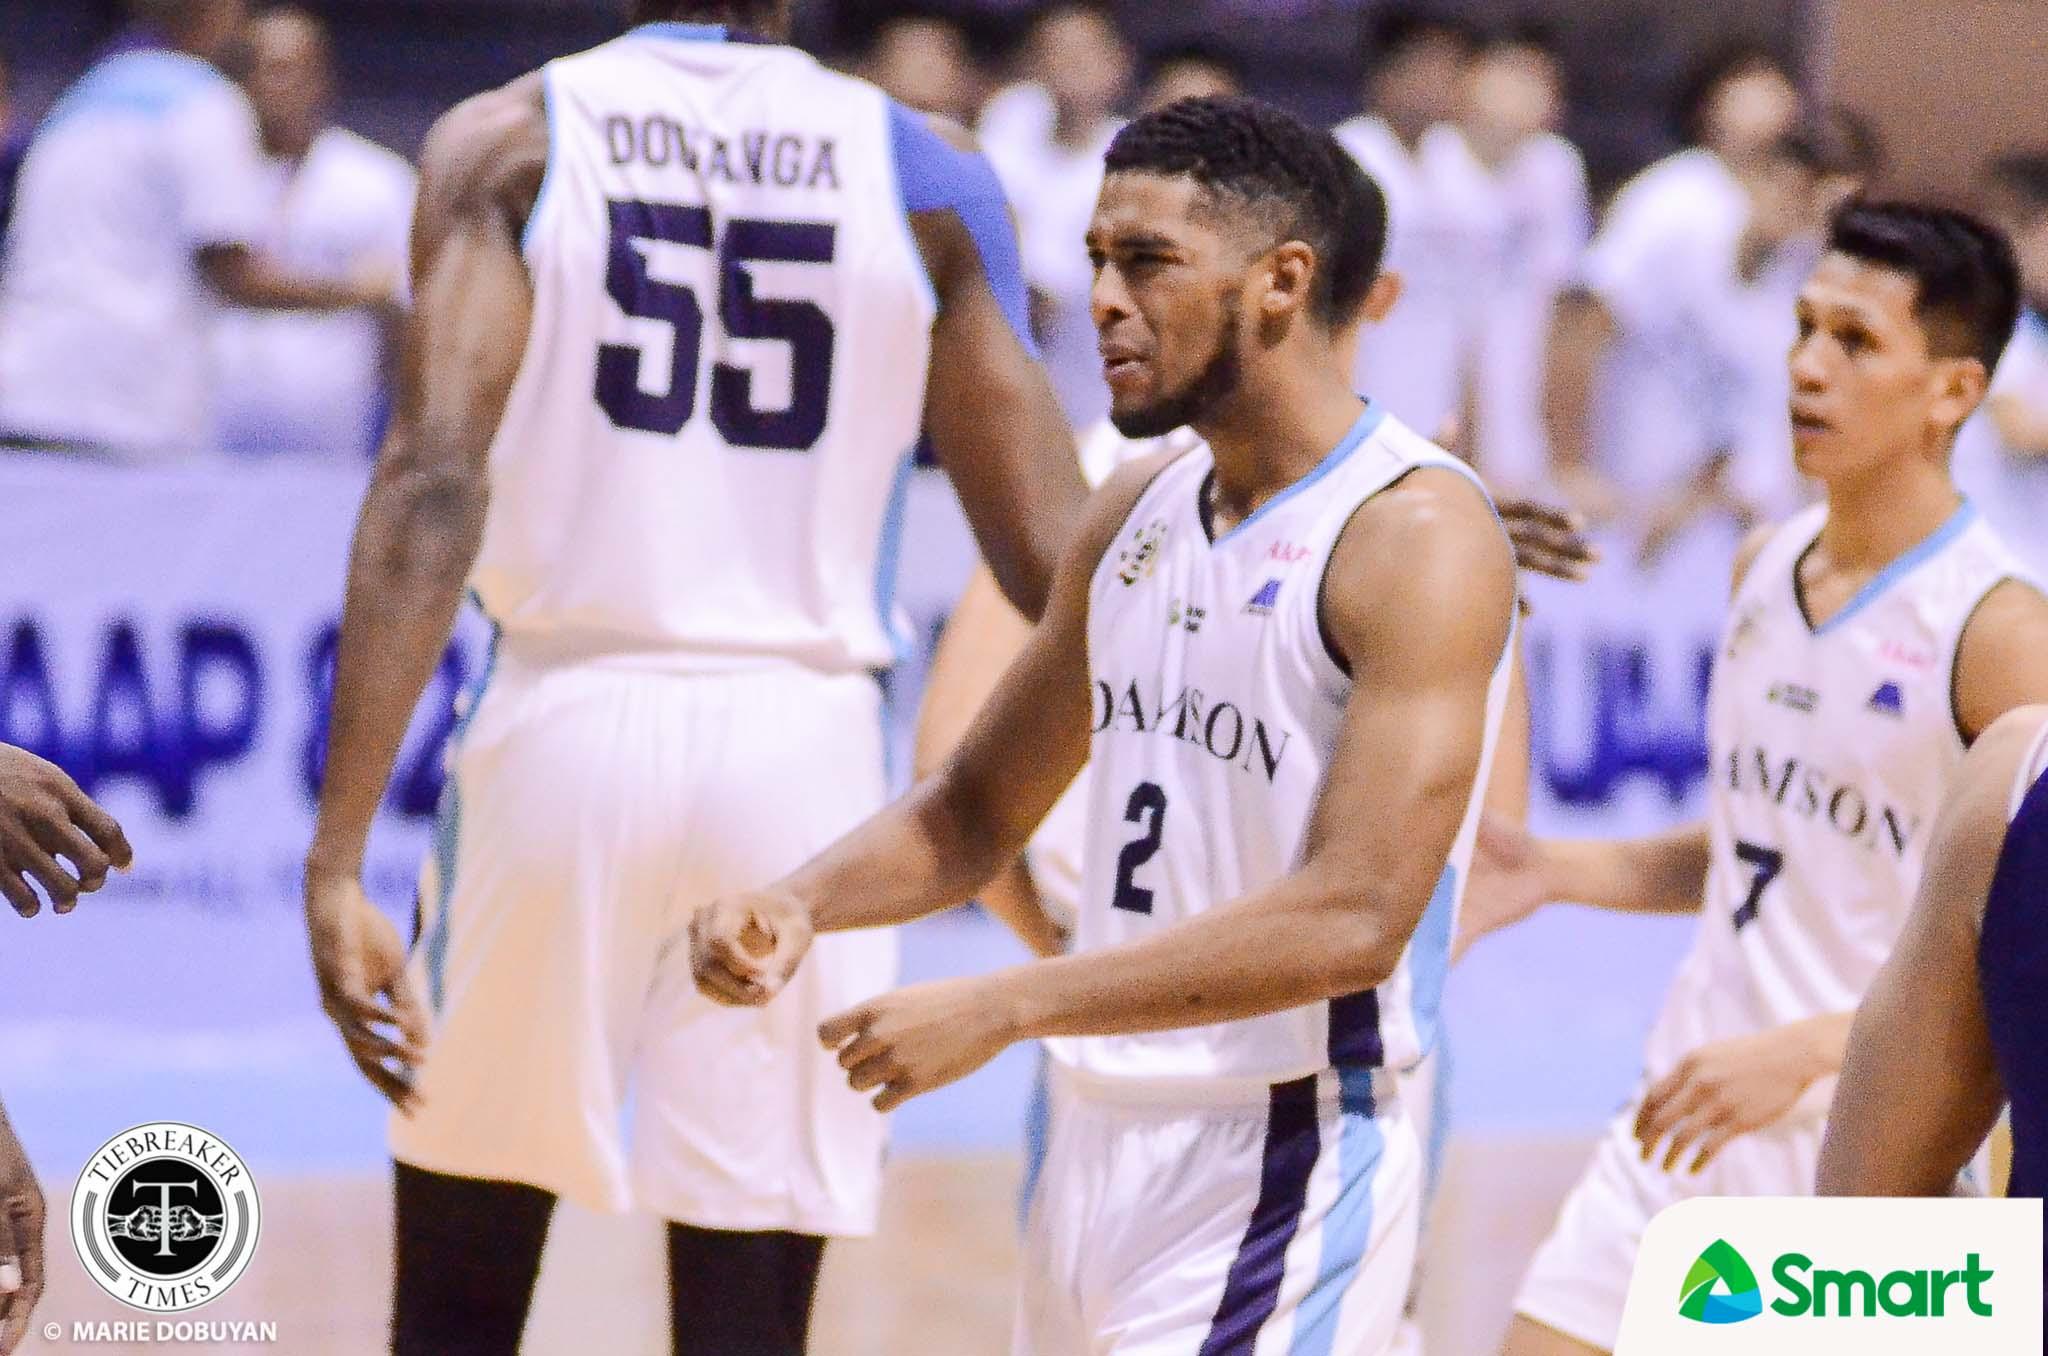 UAAP82-Mens-Basketball-ADU-vs-NU-Ahanmisi-2743 Jerrick Ahanmisi foregoes final year in Adamson, to enter 2021 PBA Draft AdU Basketball News UAAP  - philippine sports news